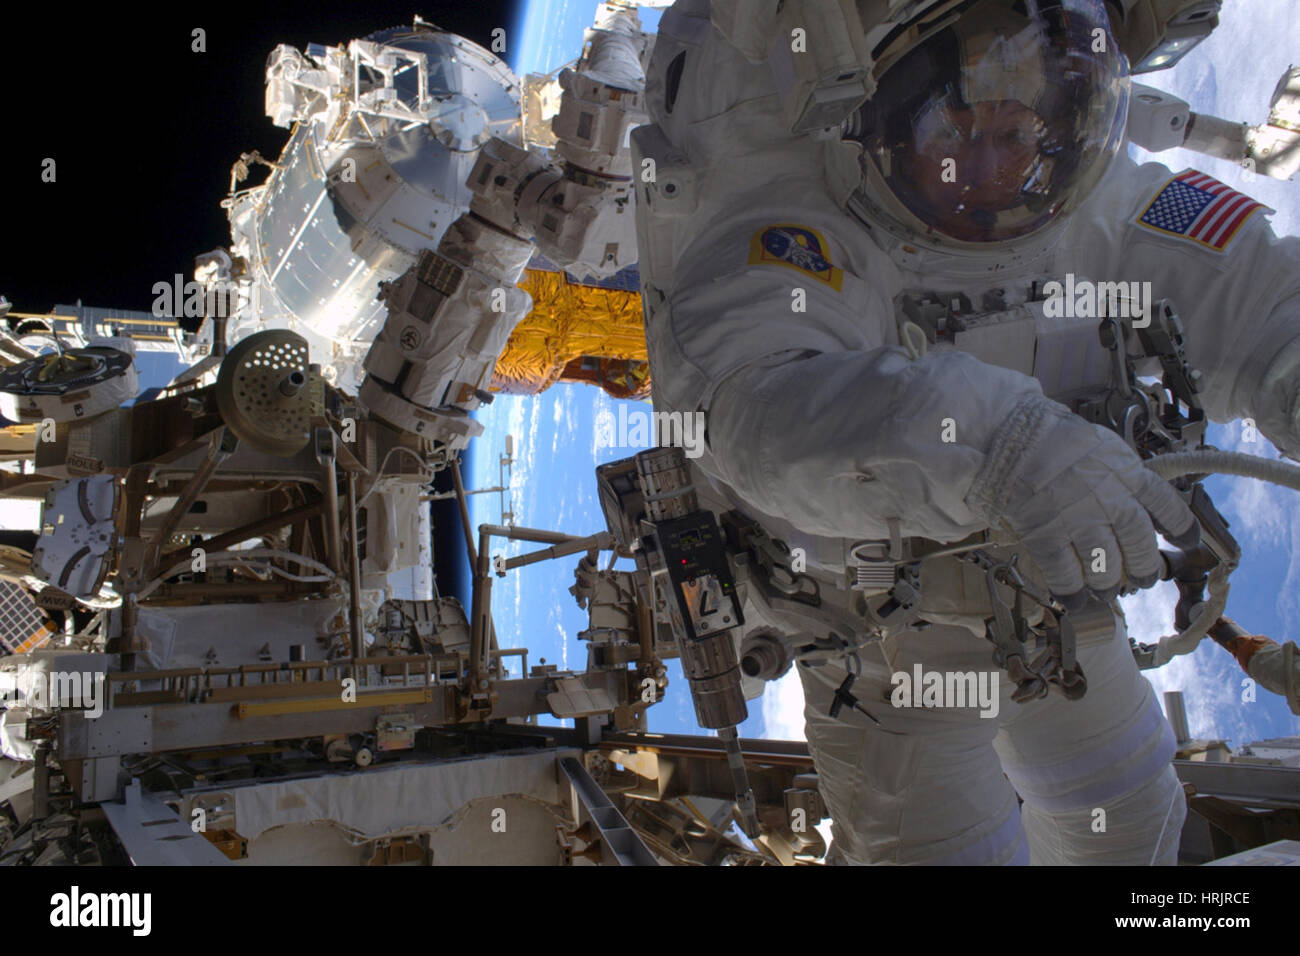 Astronaut Peggy Whitson Spacewalk - Stock Image